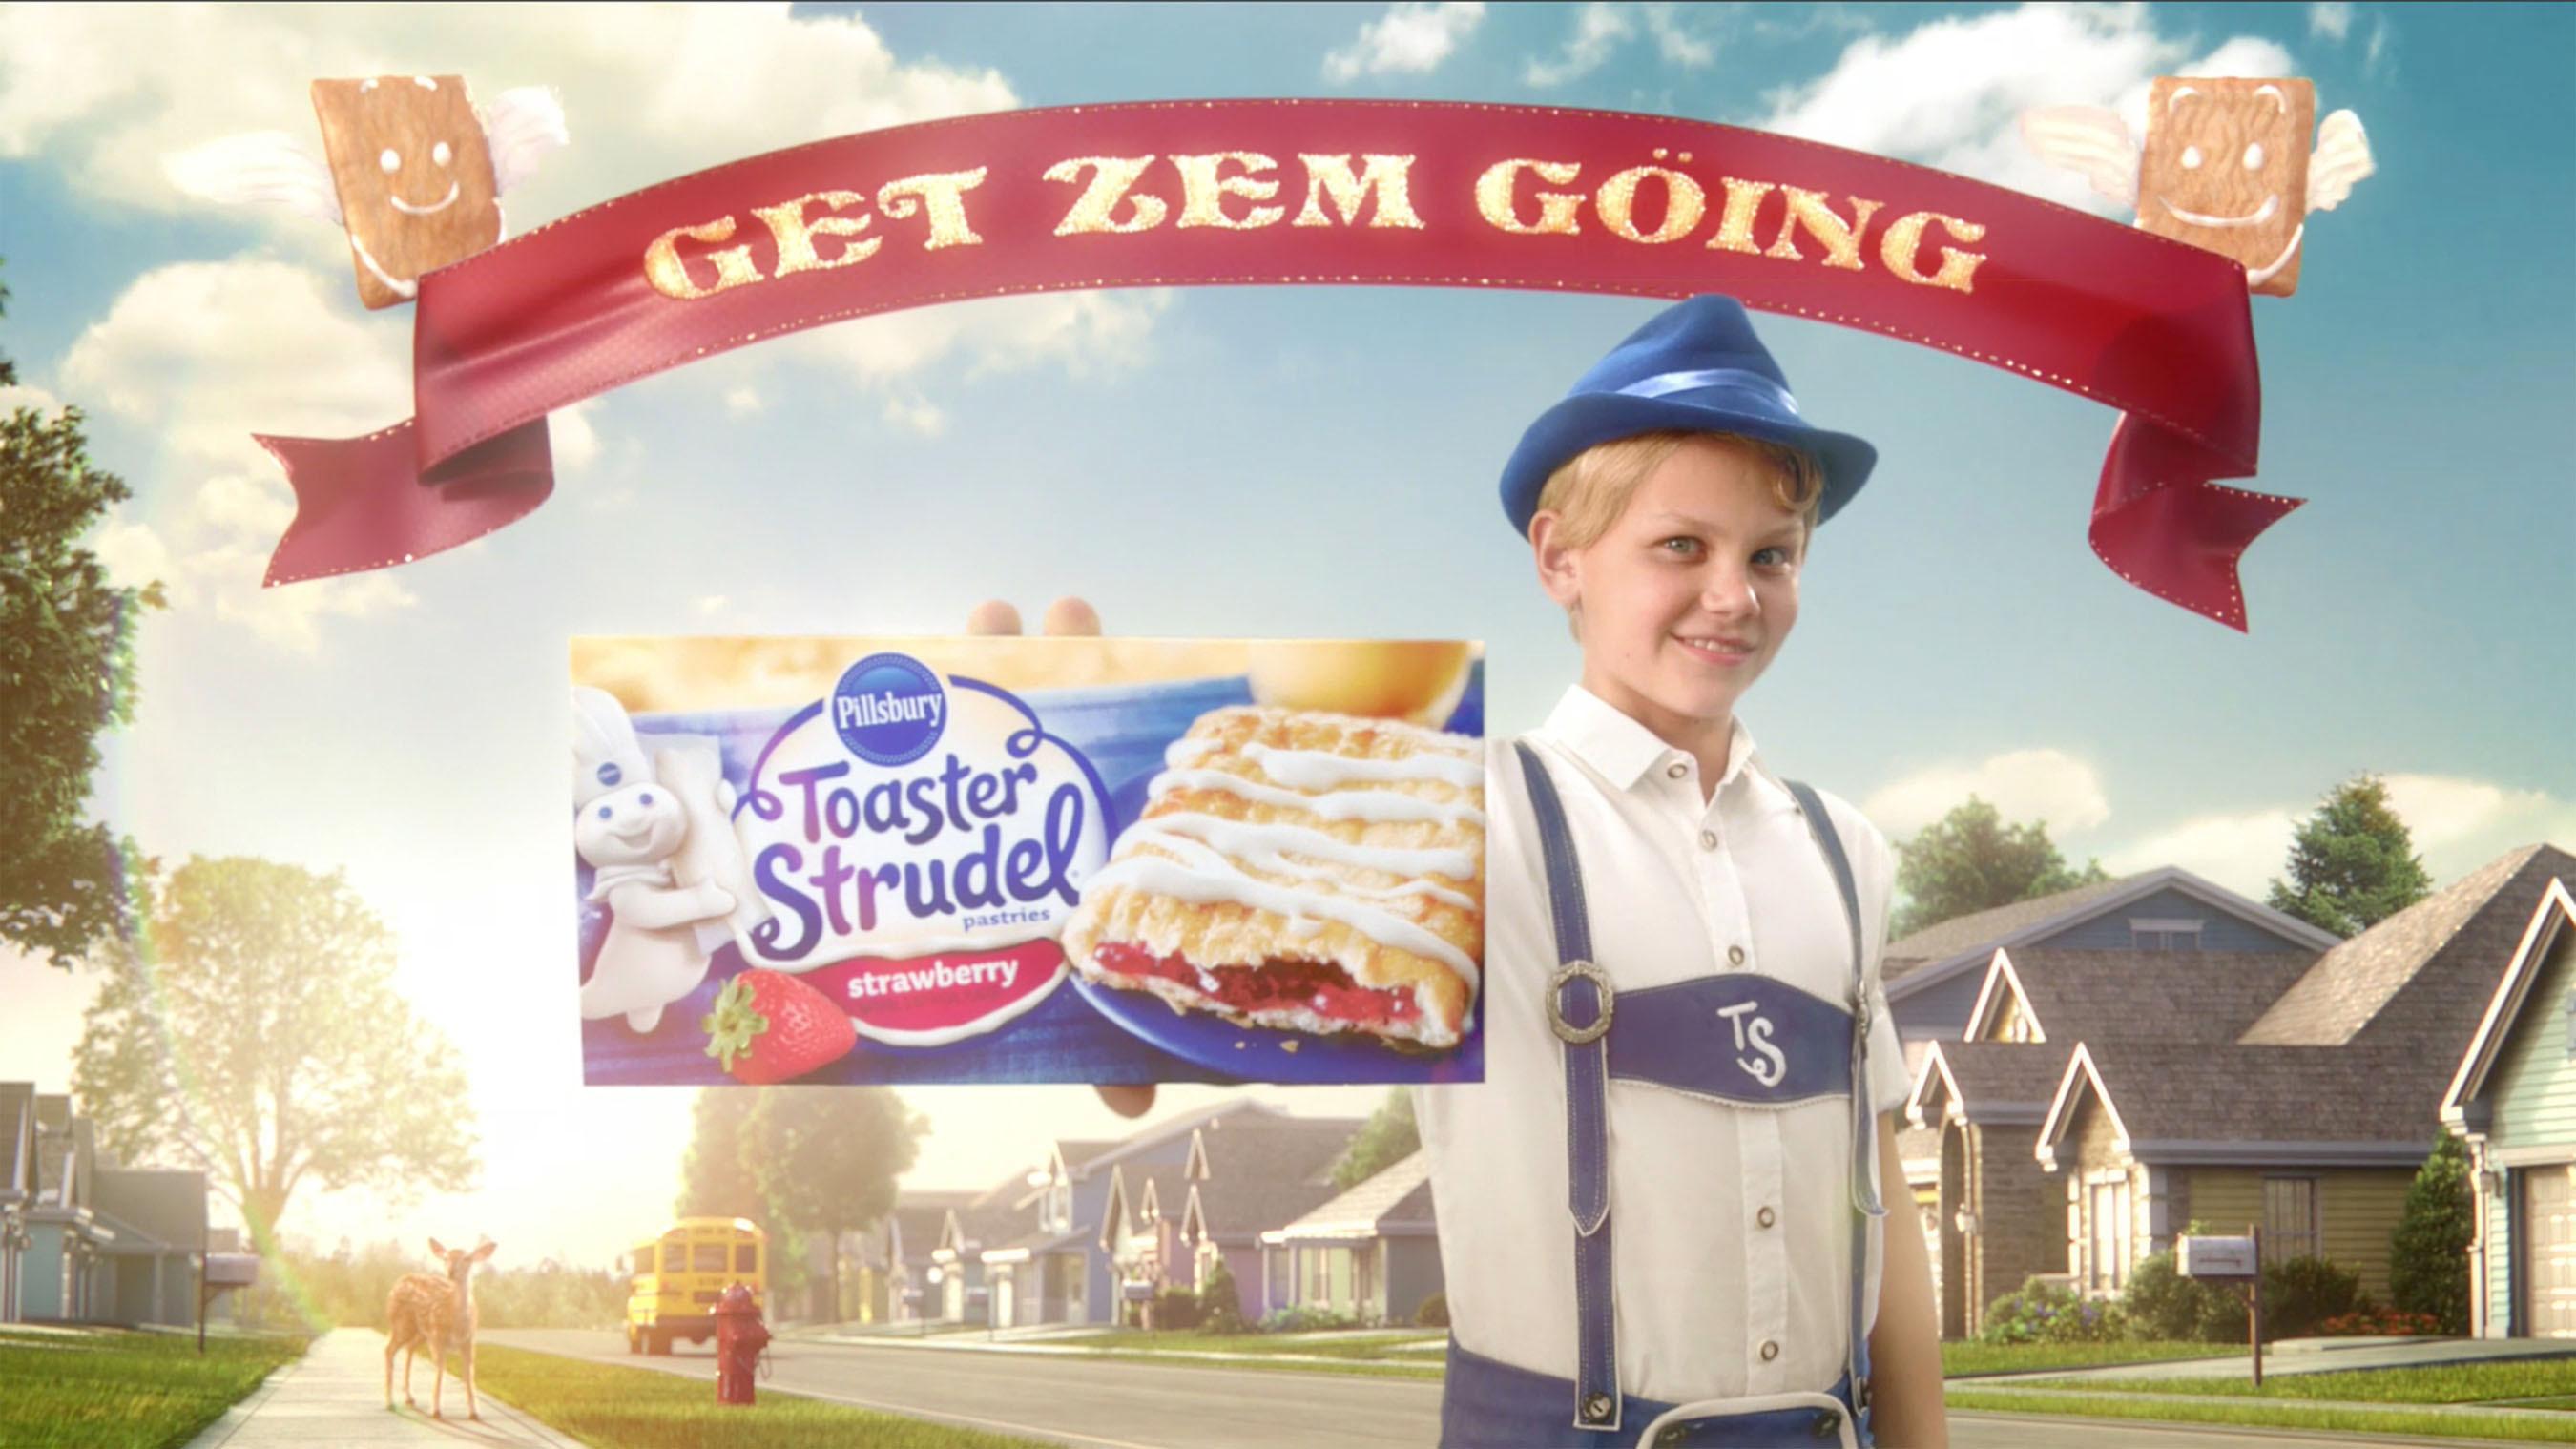 "The new face of Pillsbury Toaster Strudel, Hans Strudel, helps ""Get Zem Going!"". (PRNewsFoto/Pillsbury Toaster Strudel) (PRNewsFoto/PILLSBURY TOASTER STRUDEL)"